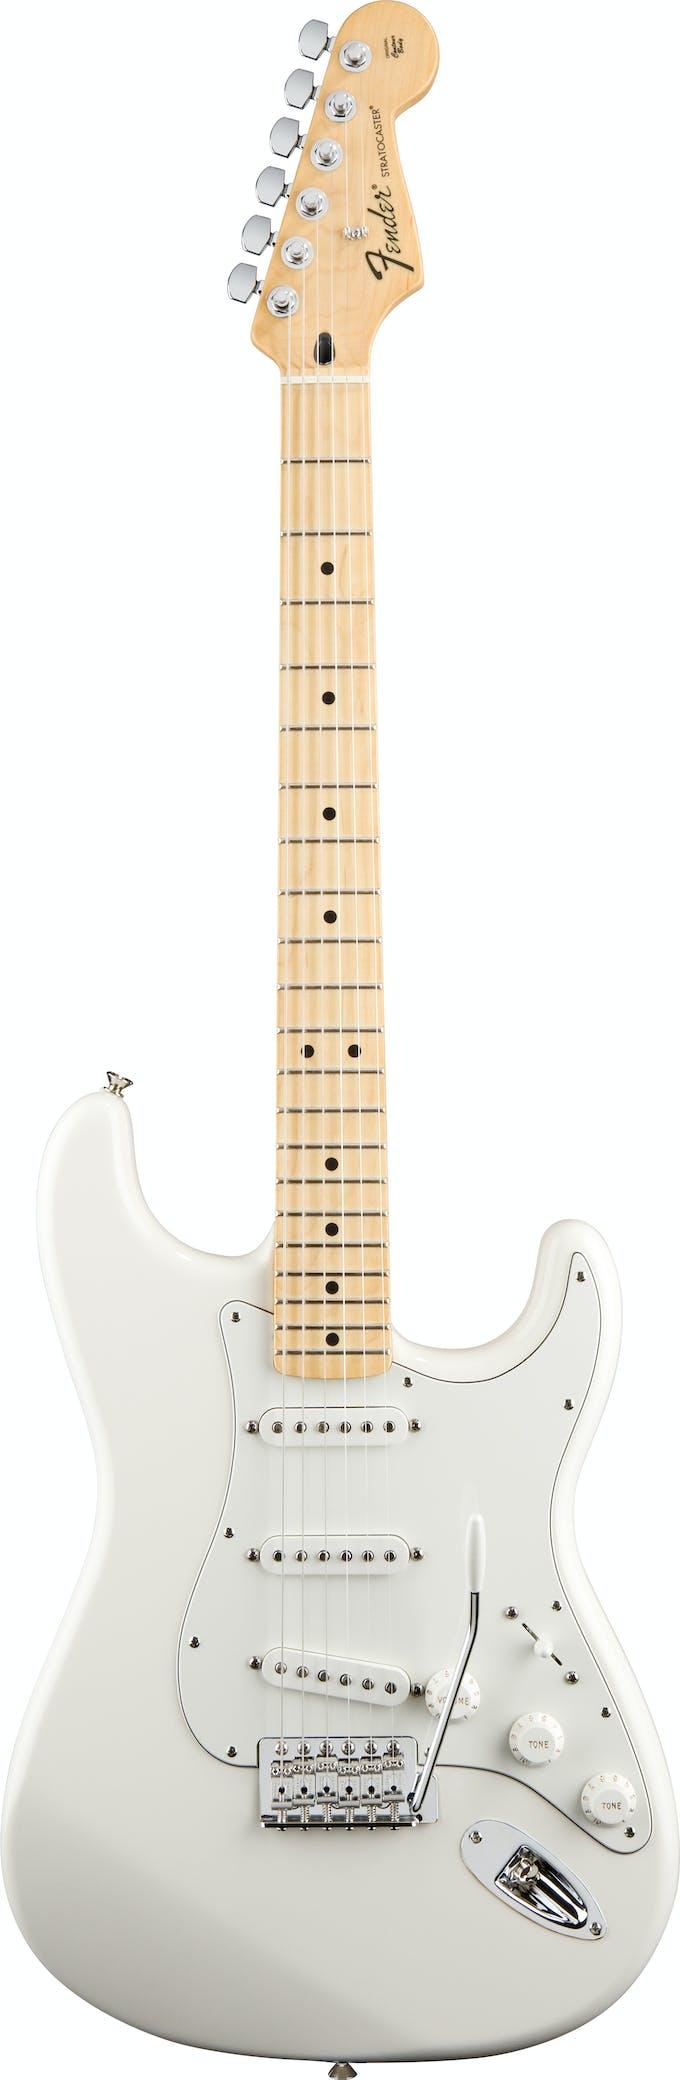 Fender Standard Strat Arctic White Maple Fretboard Andertons